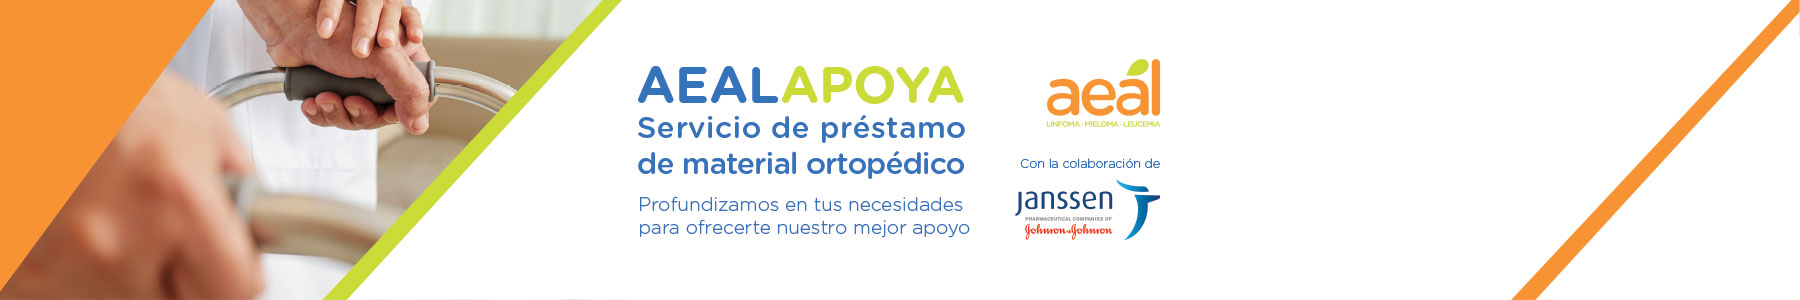 banner-web-aeal-apoya-2020